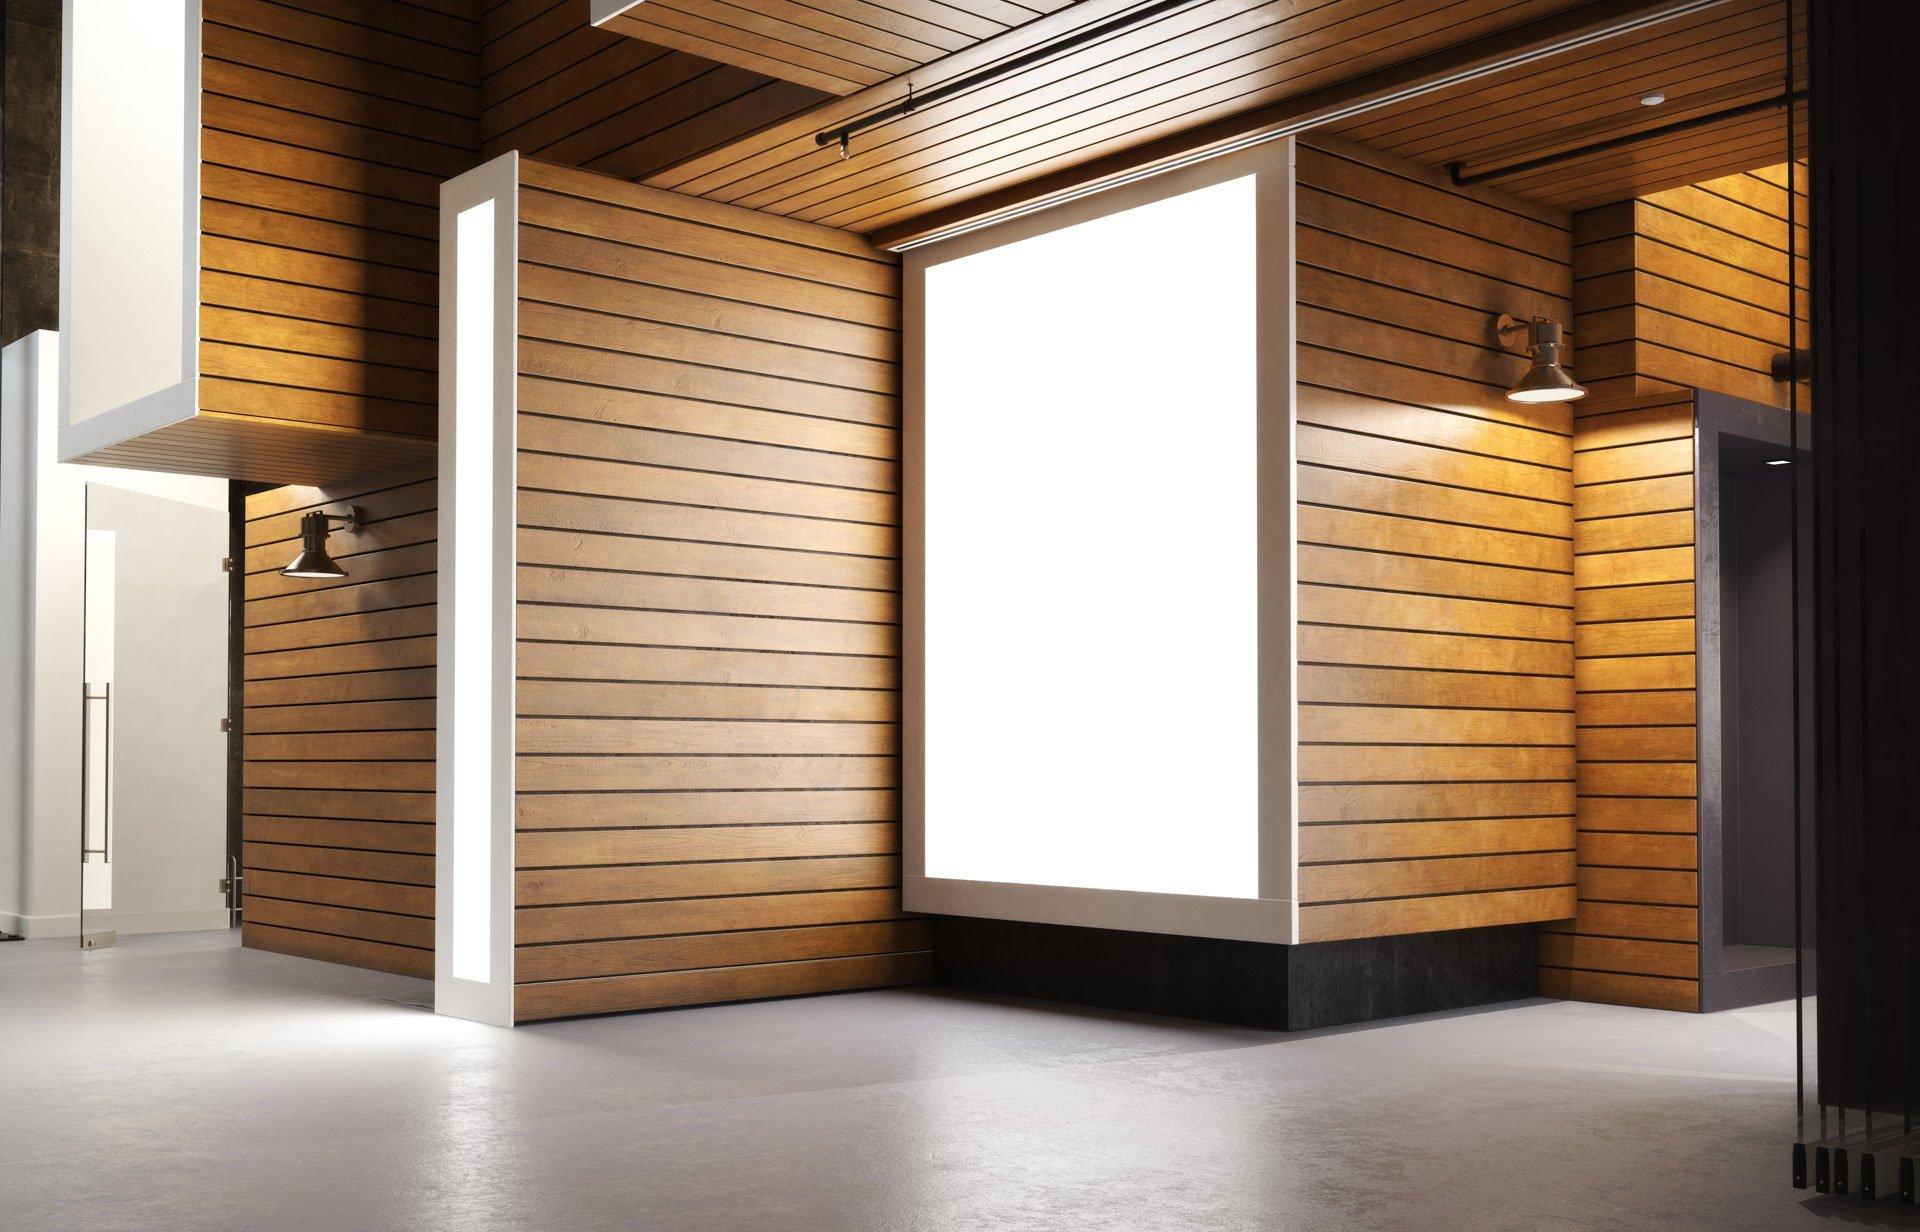 Locally sourced custom wood panel wall in La Plata, Oxford